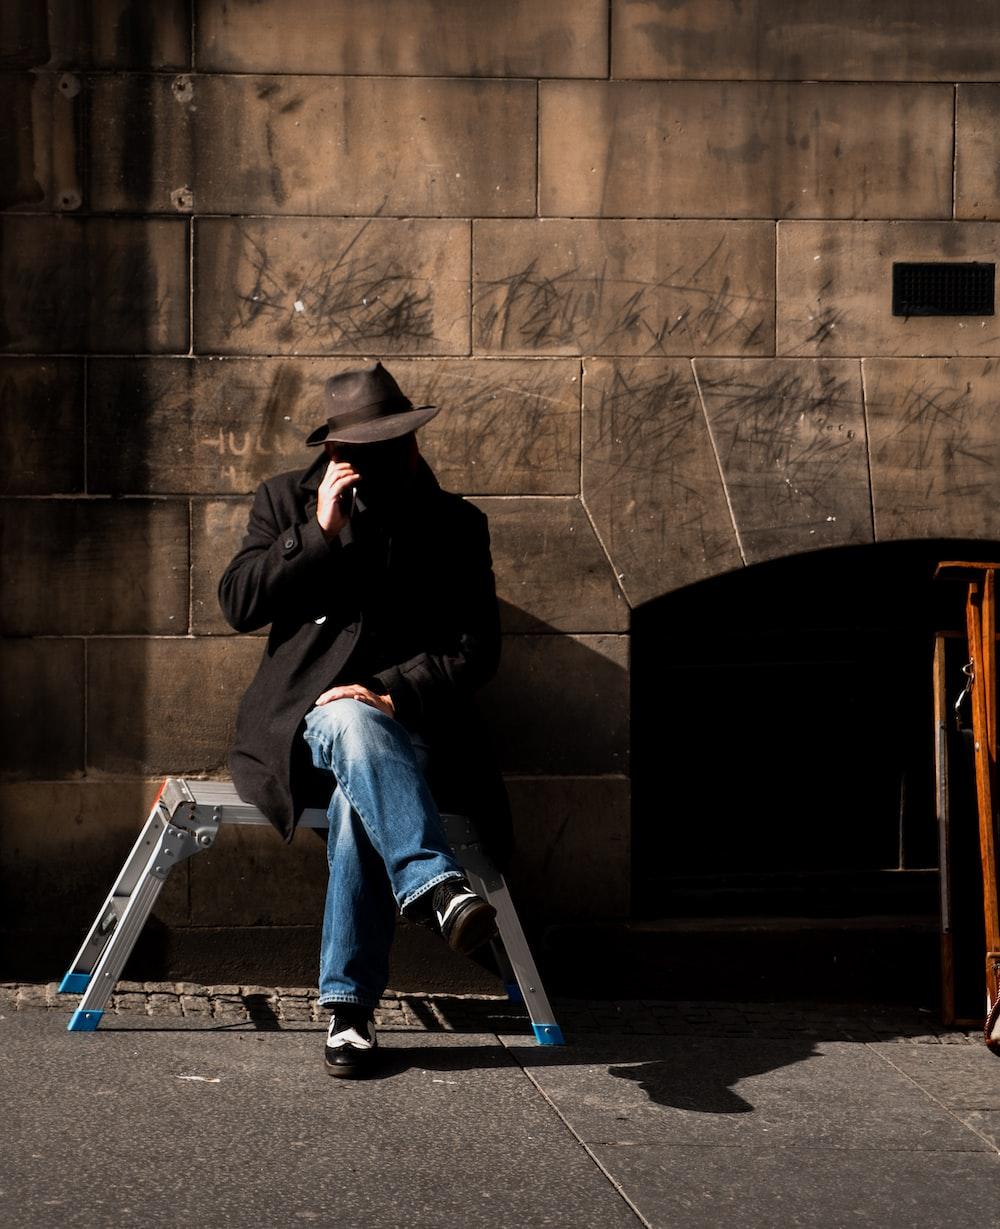 man sitting on stool near wall